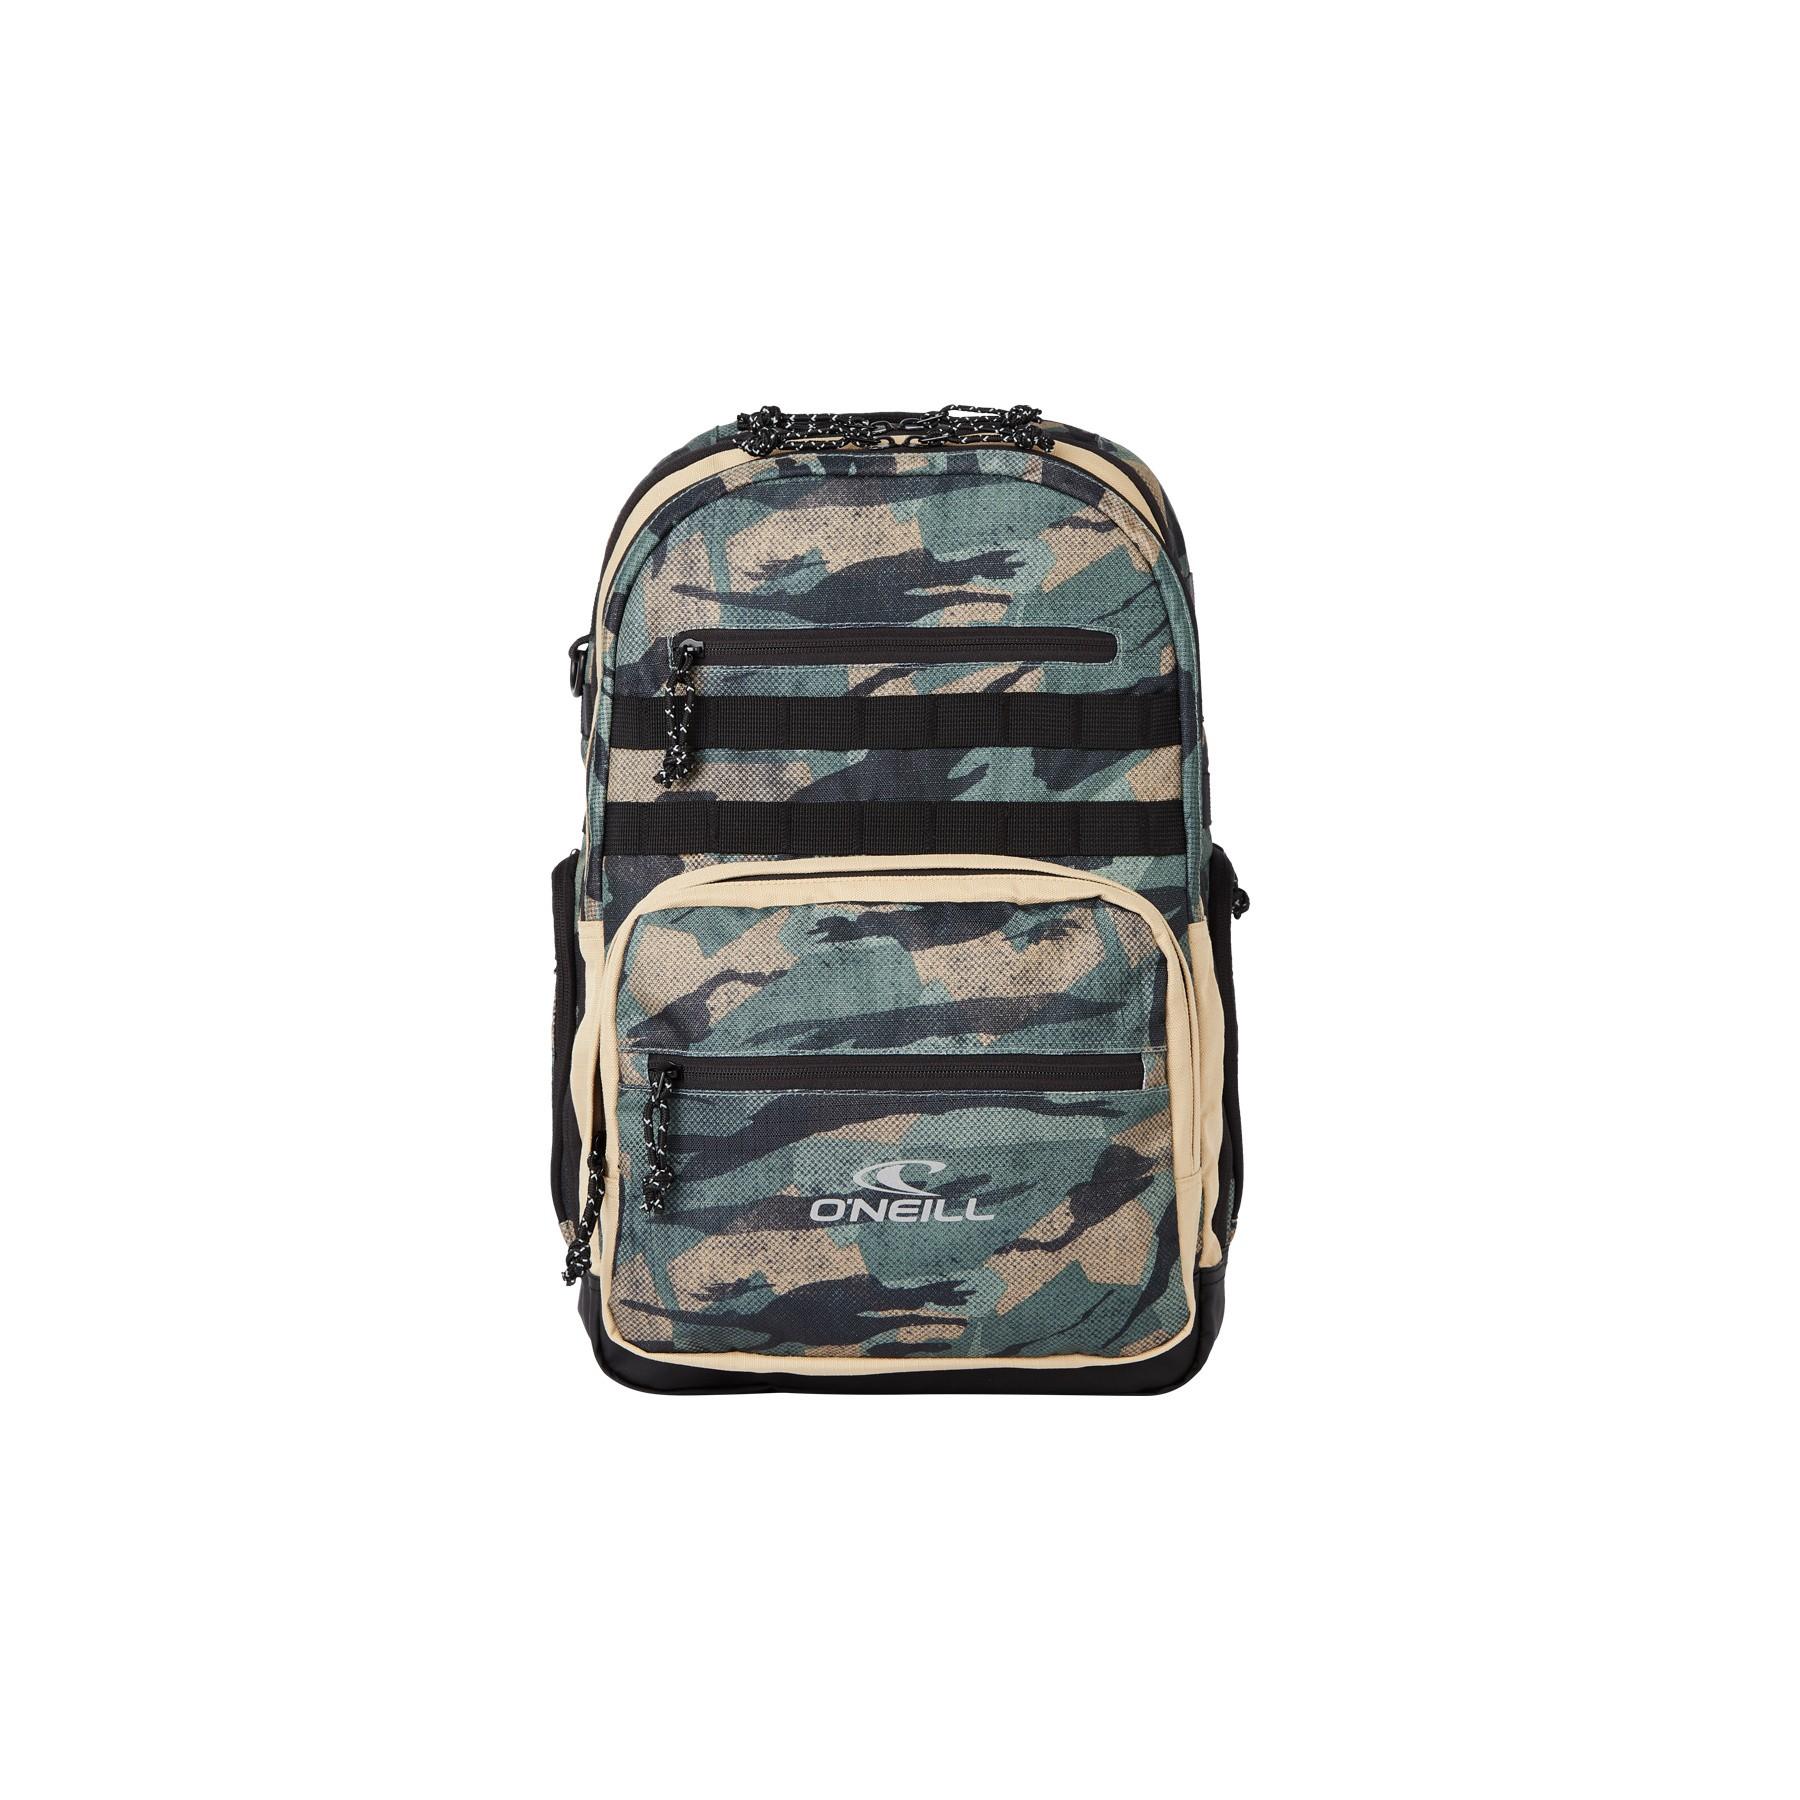 O'Neill President Backpack 6990 Green AOP